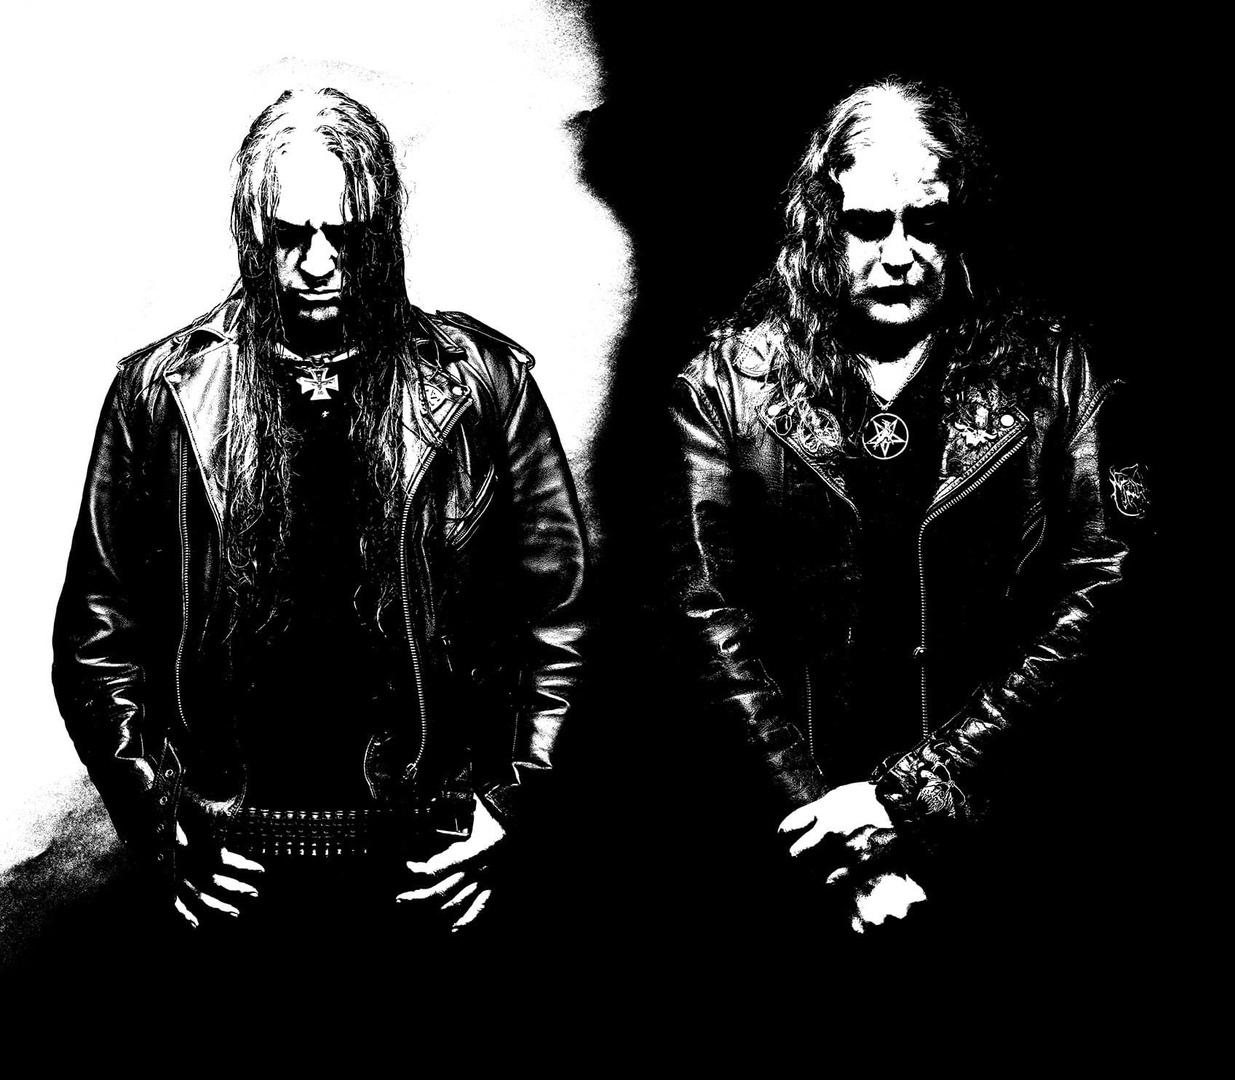 Концерт Marduk Crystal Hall